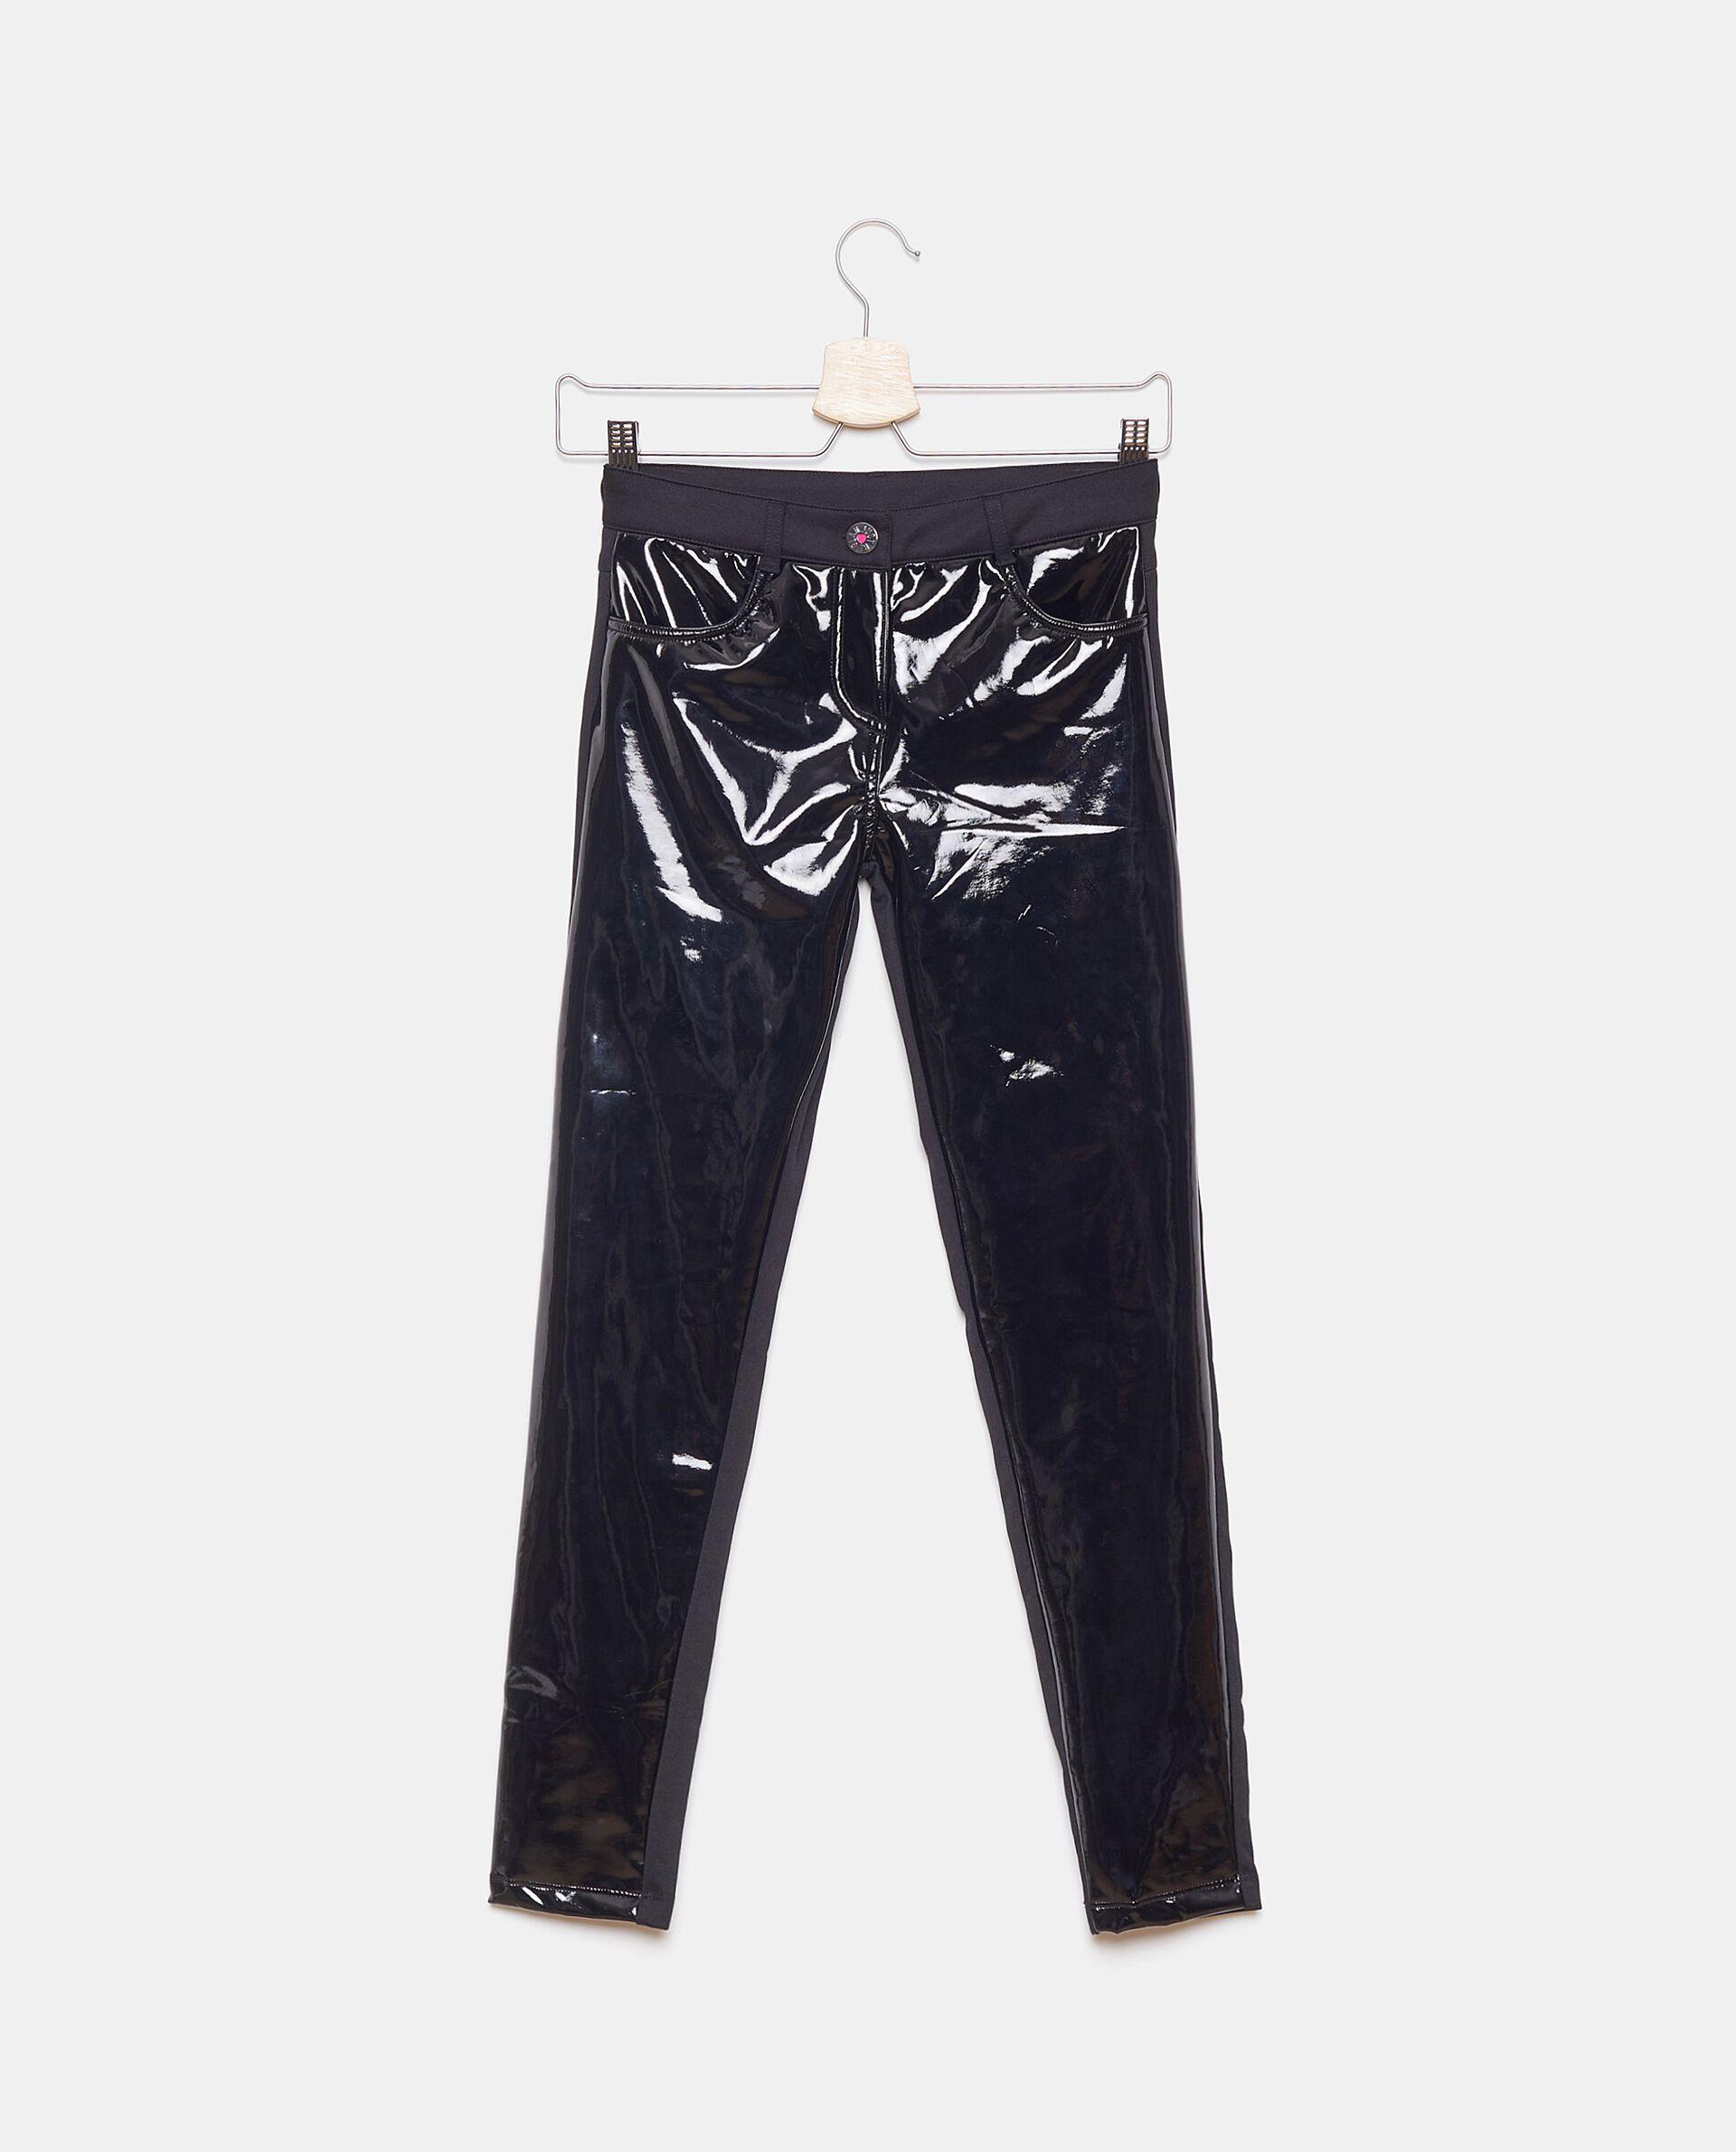 Pantaloni vinile in tinta unita ragazza